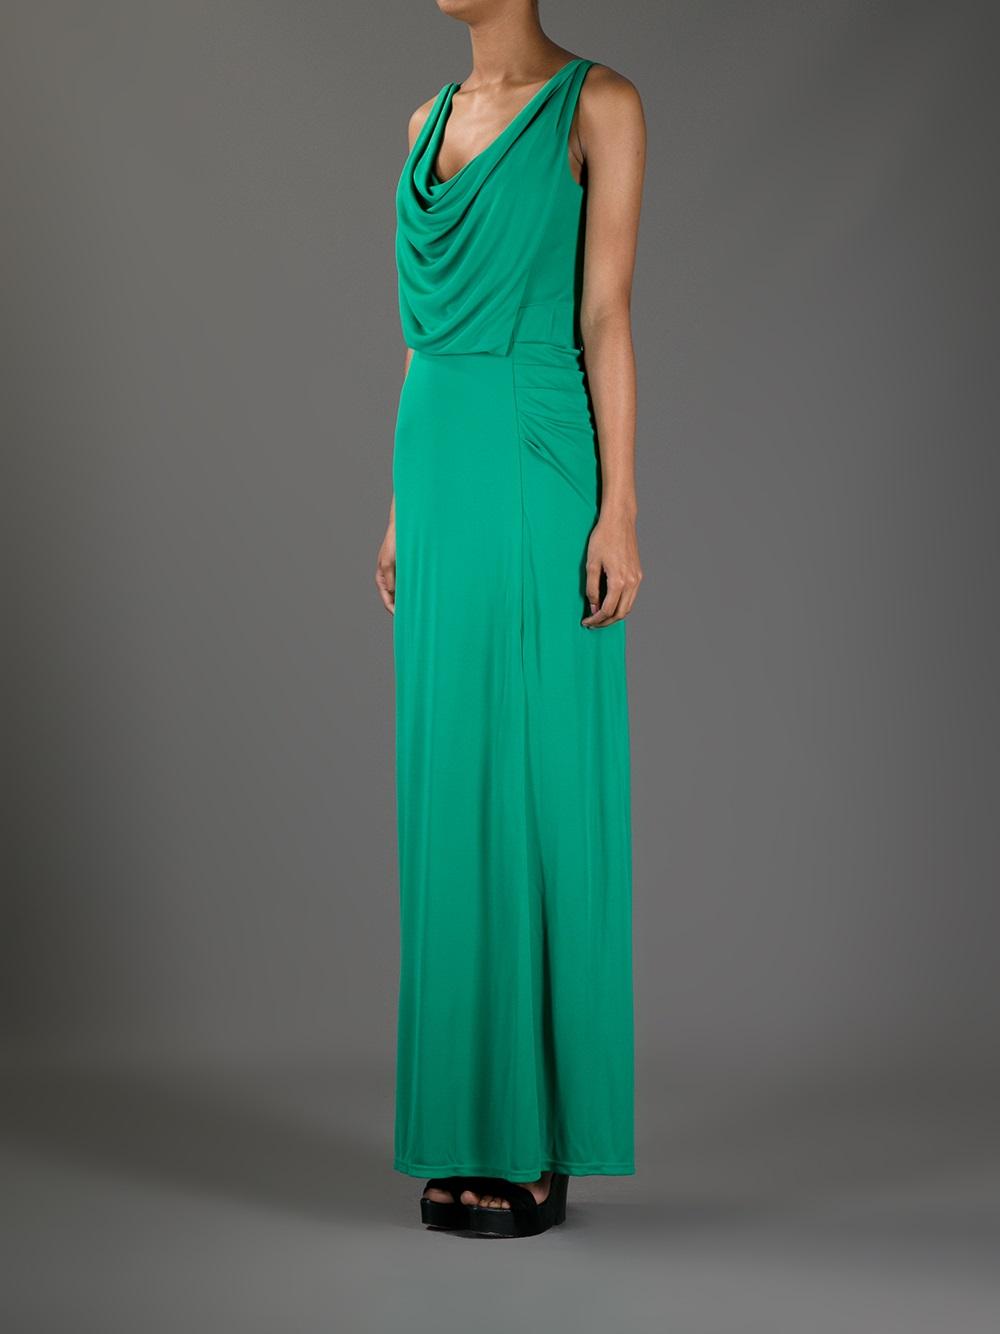 Lyst - Bcbgmaxazria Cowl Neck Maxi Dress in Green